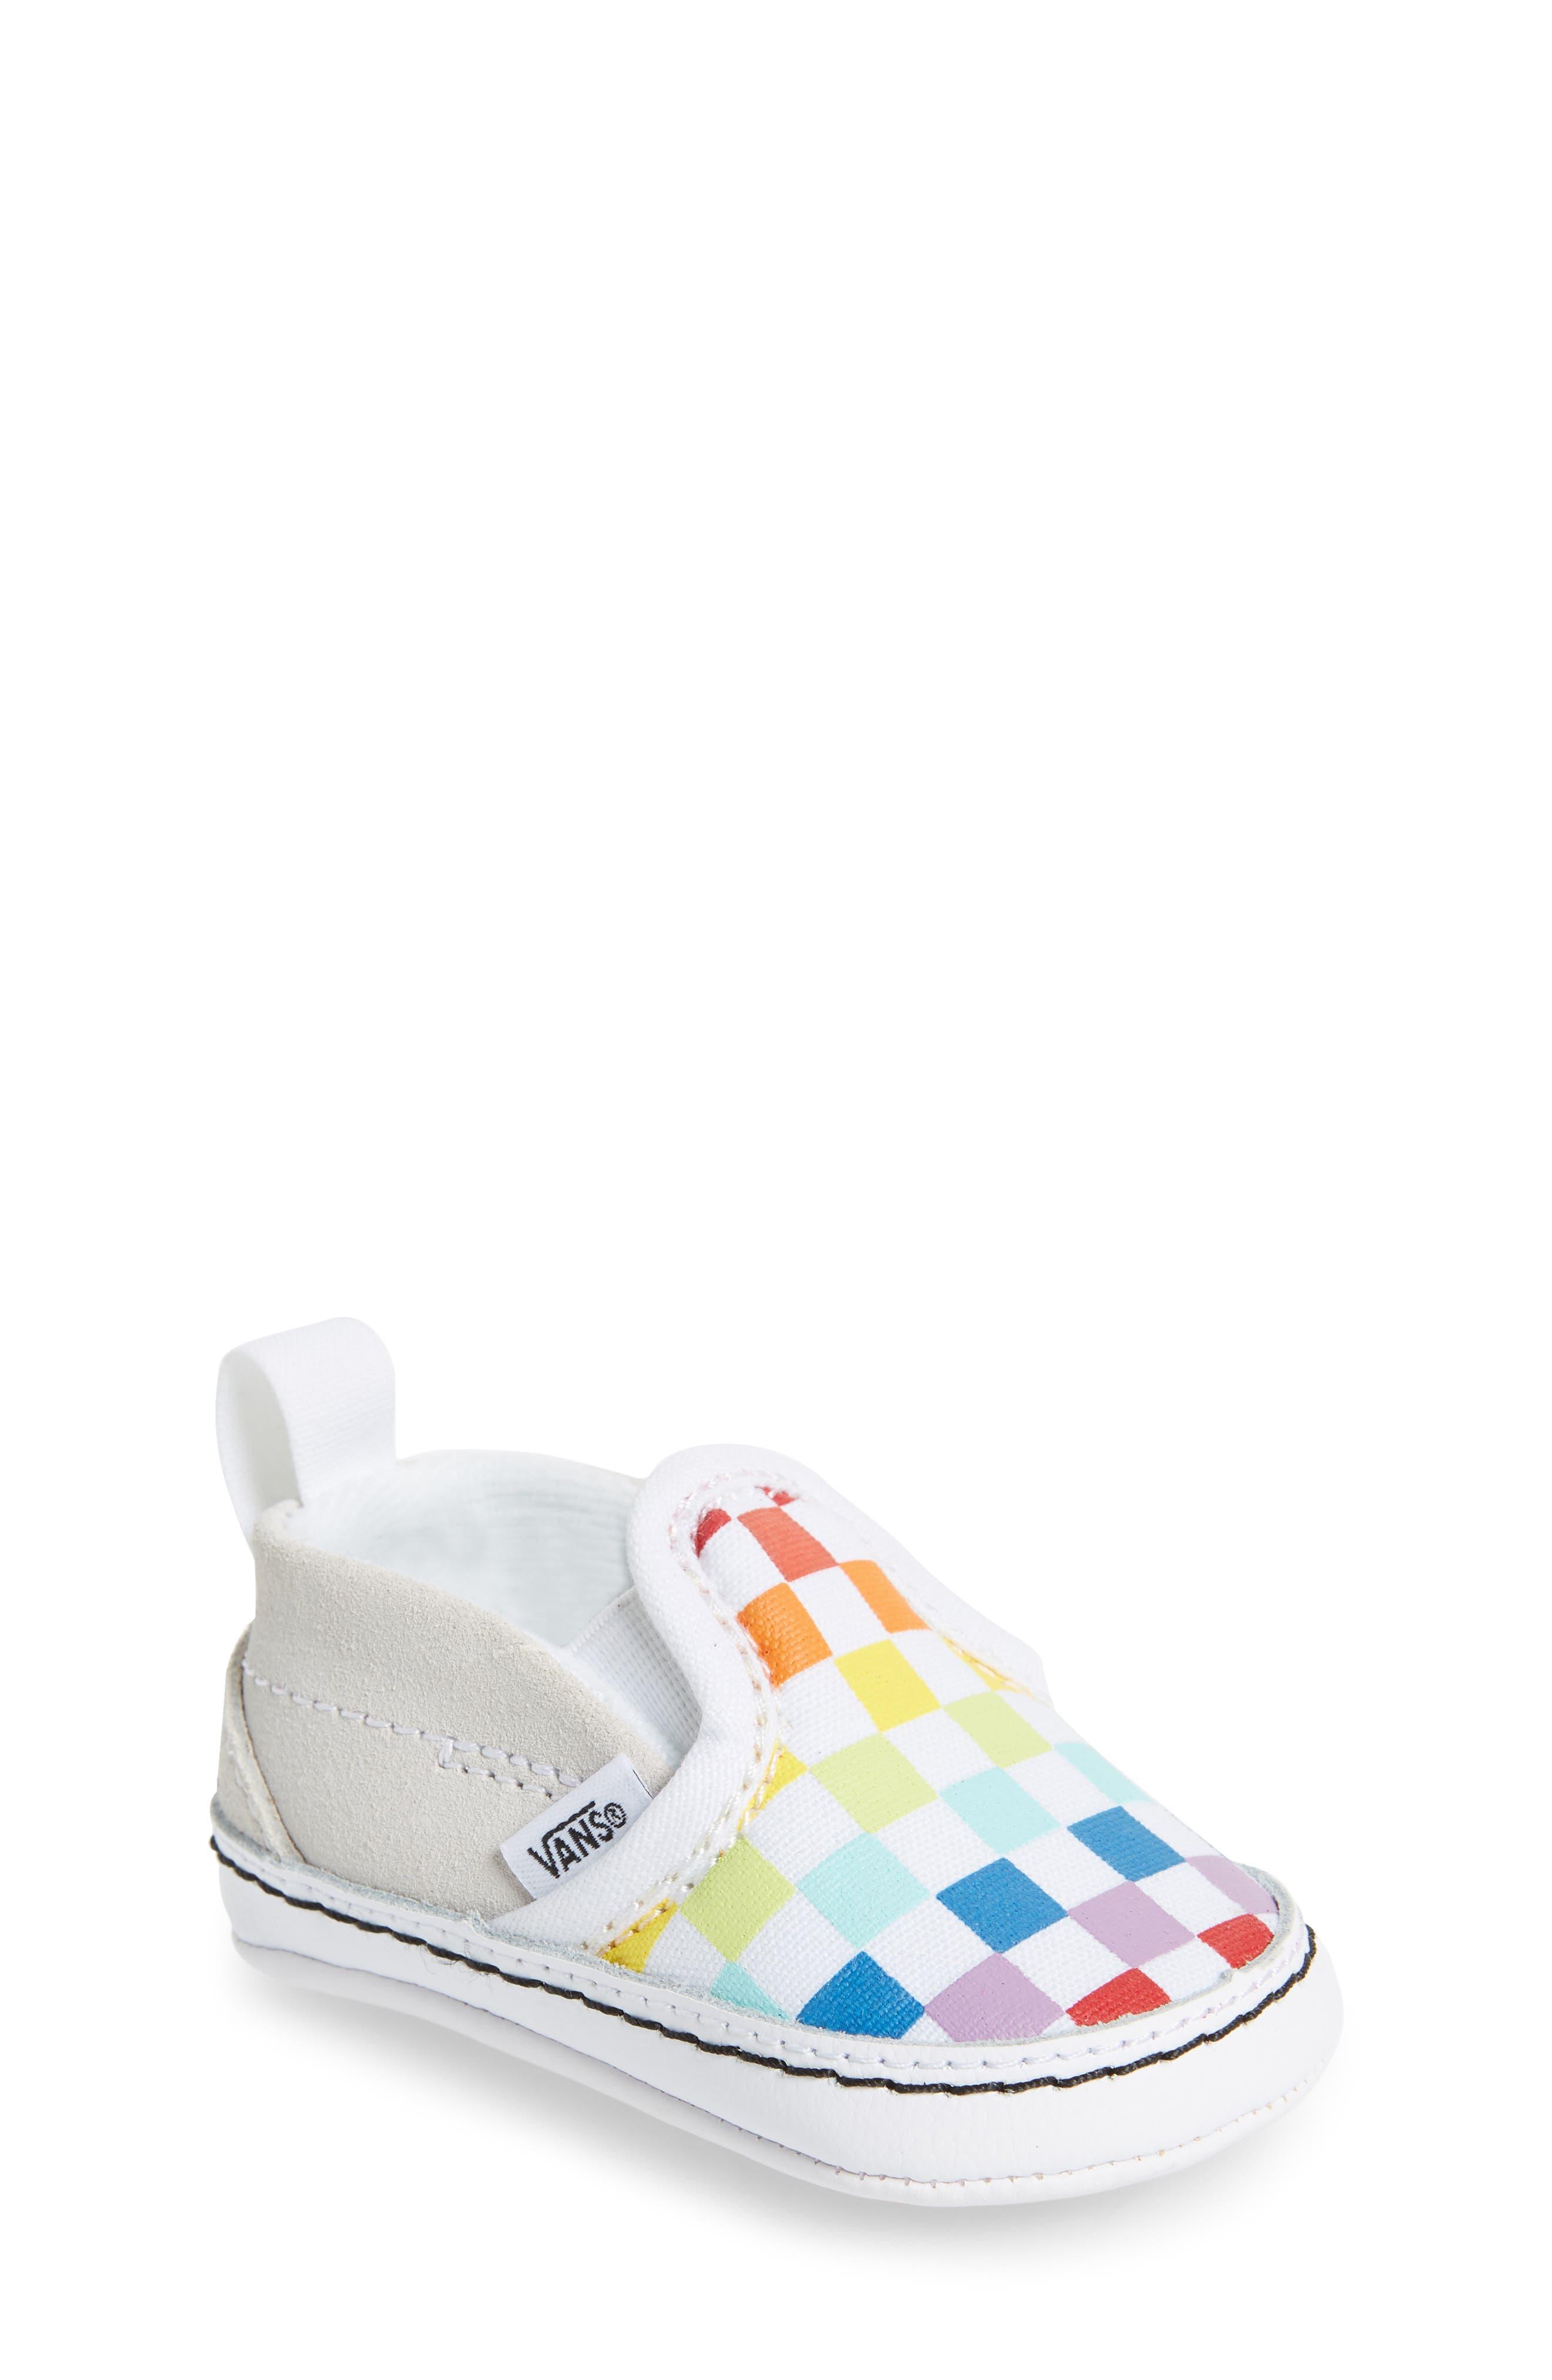 Slip-On Crib Shoe,                         Main,                         color, Checkerboard Rainbow/ White